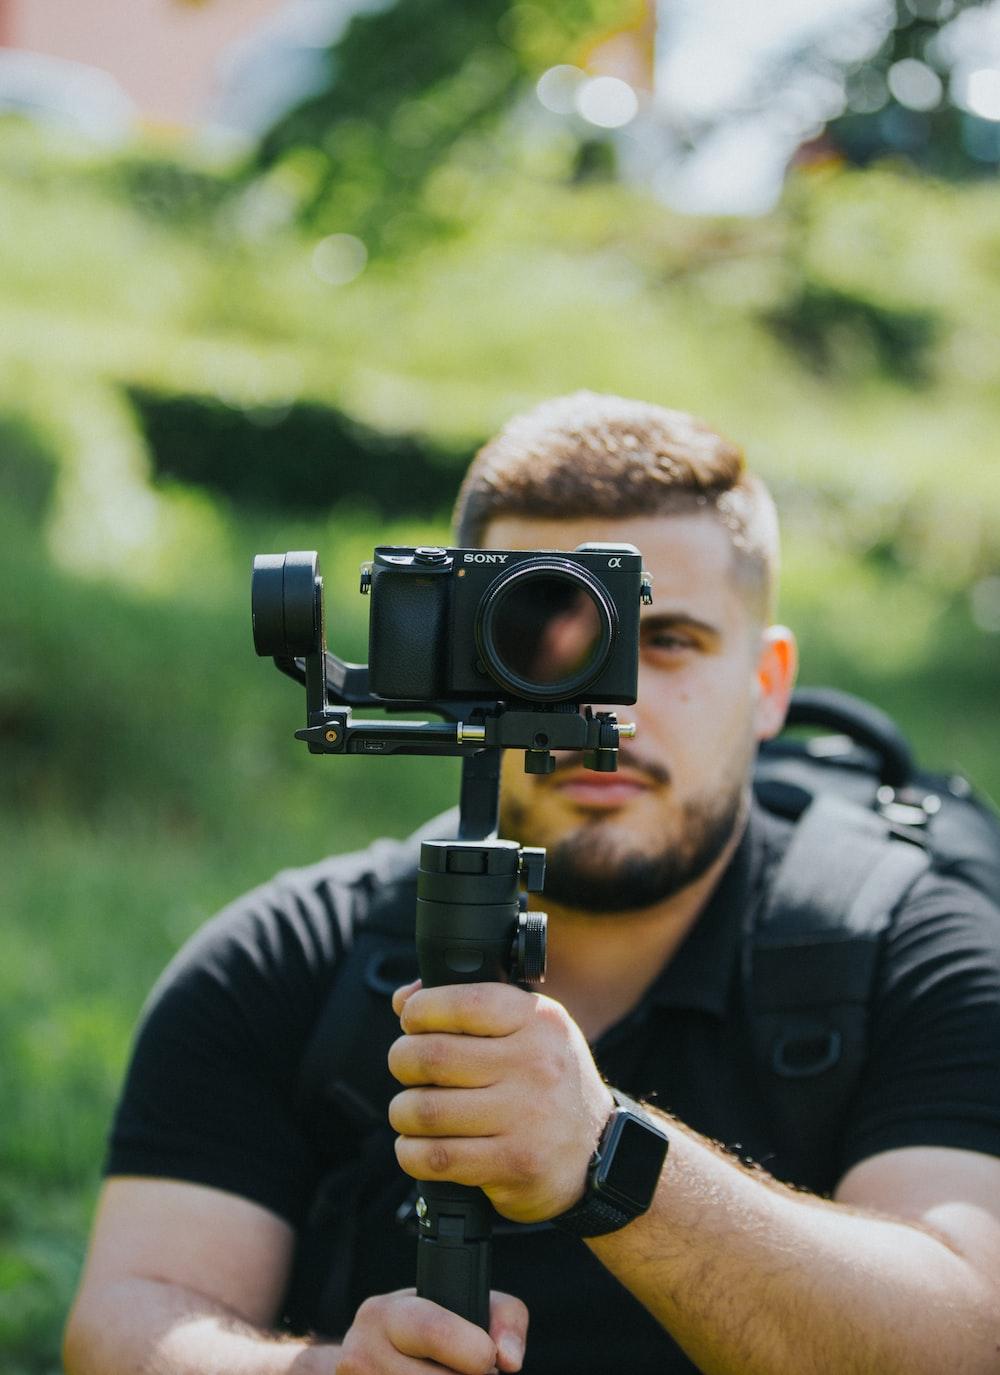 man wearing black shirt holding Sony DSLR camera